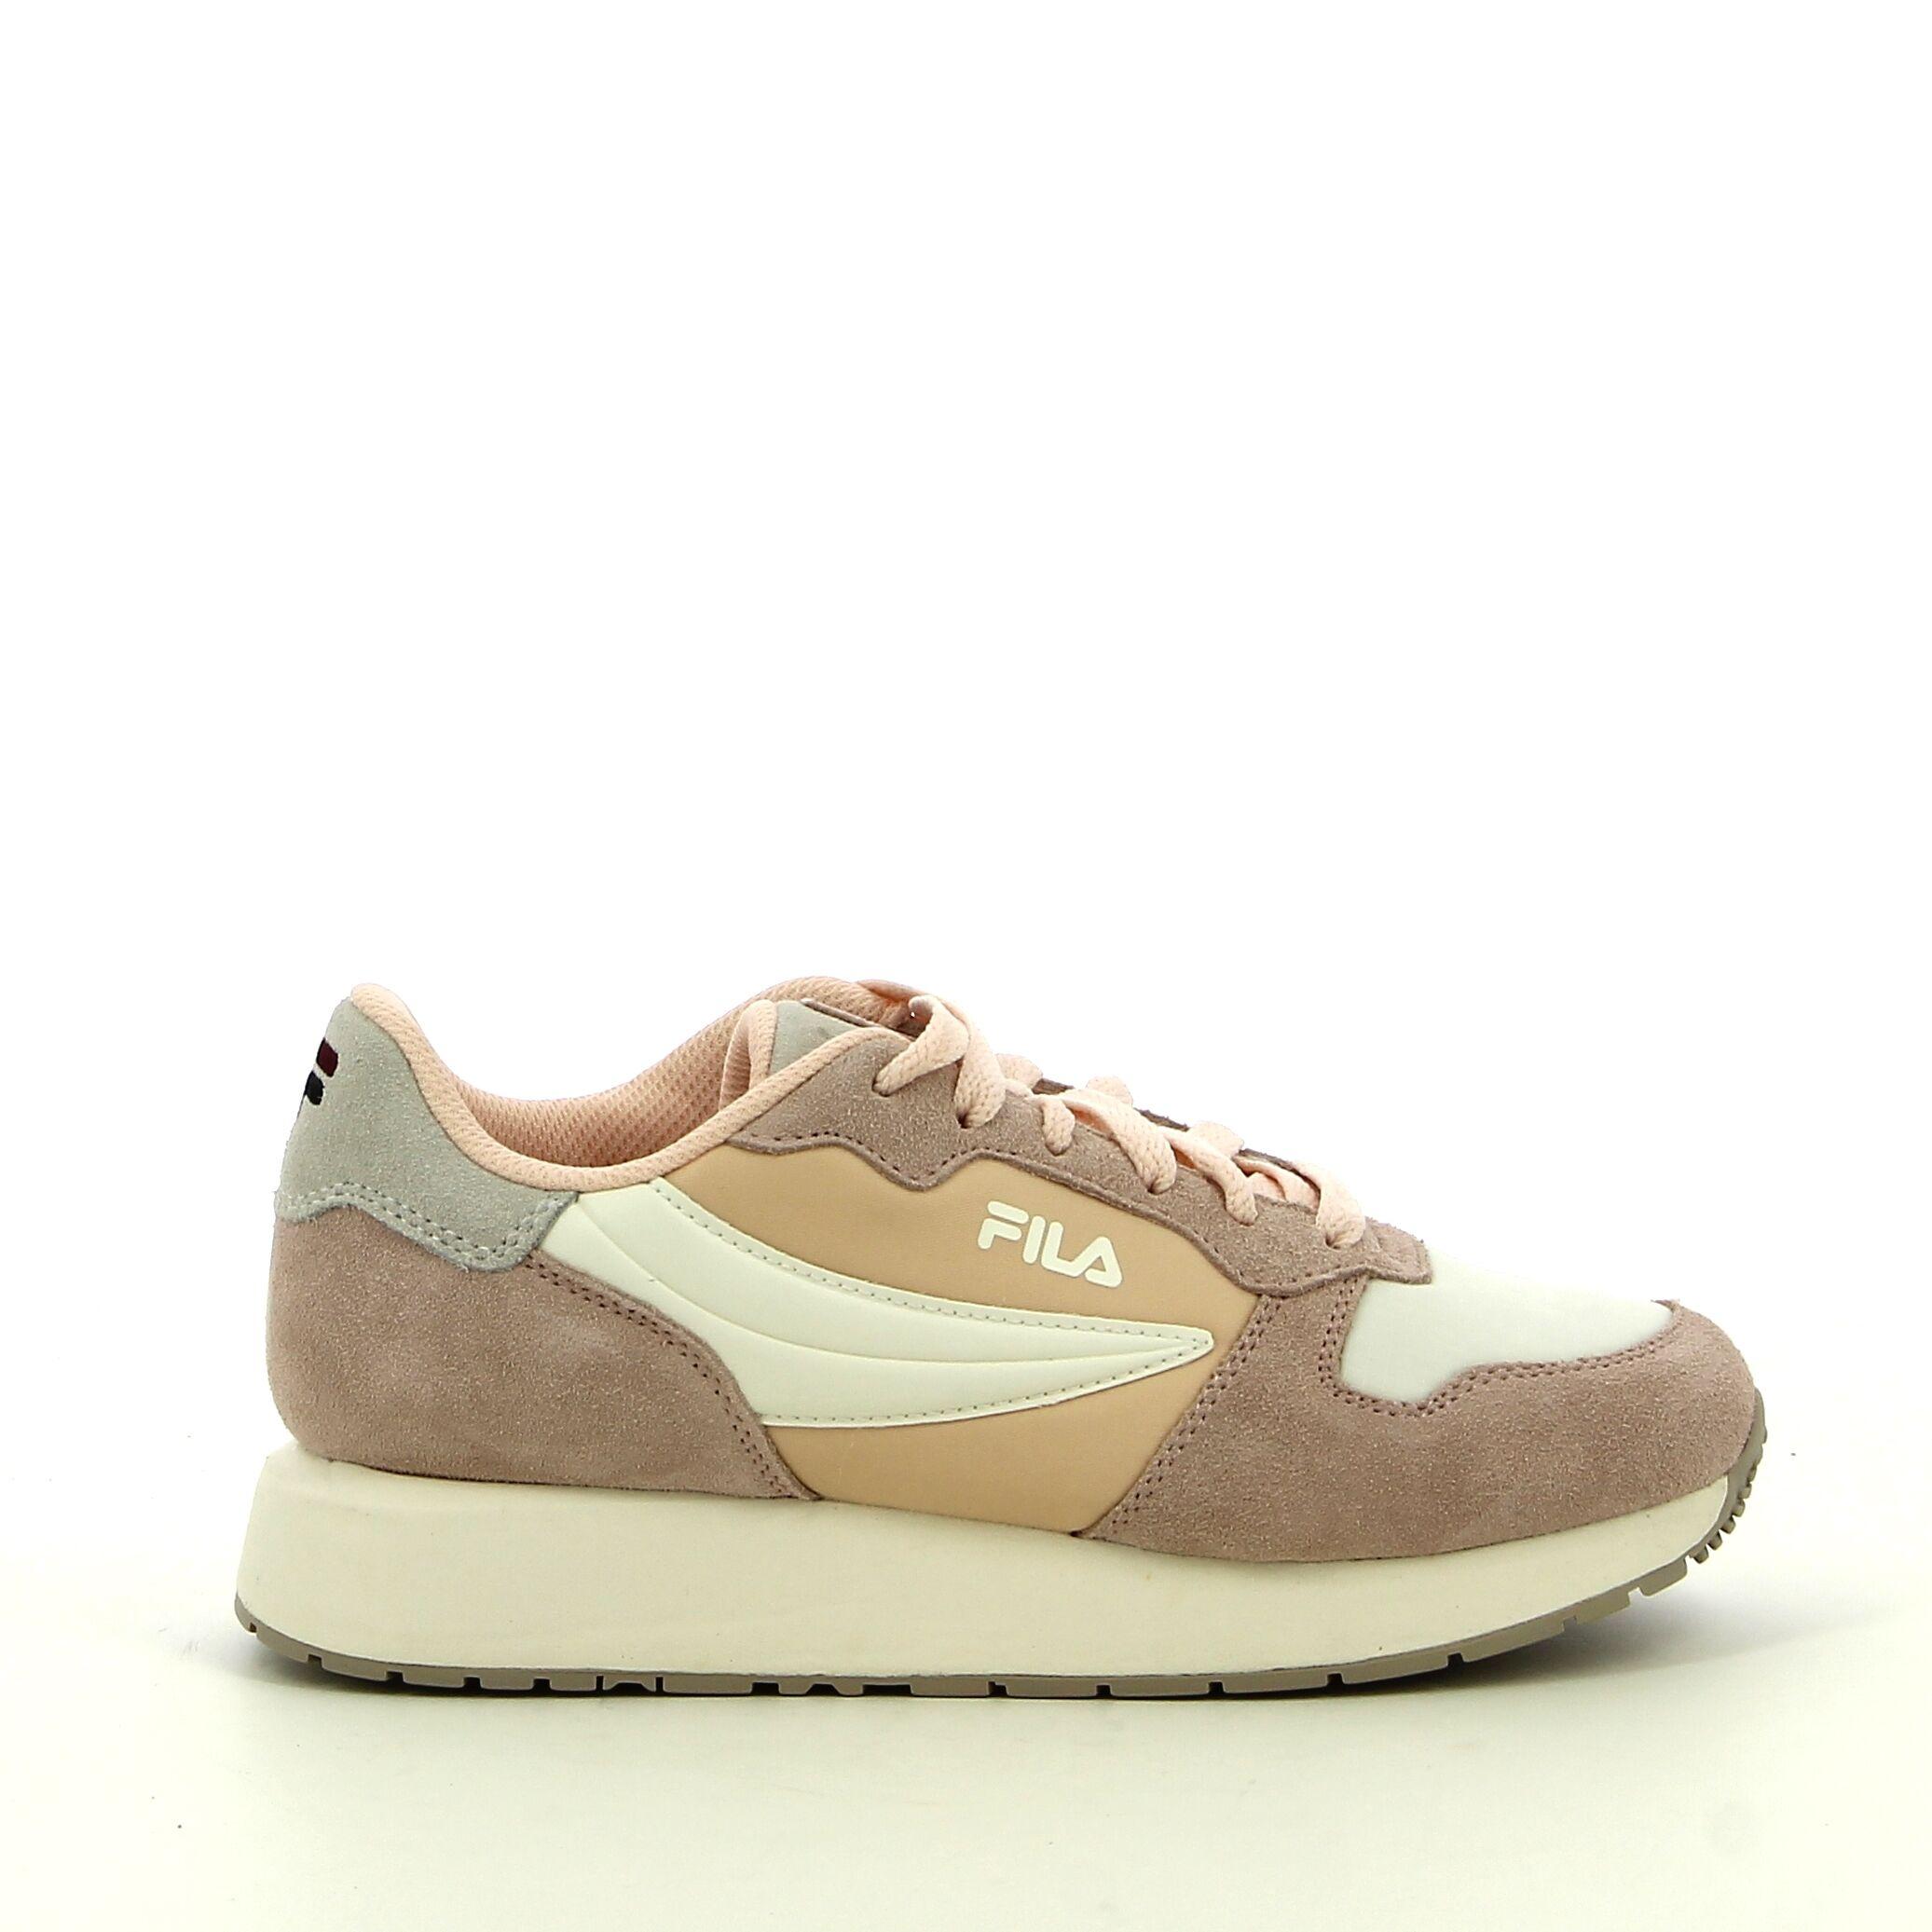 Fila - Nude - Sneakers